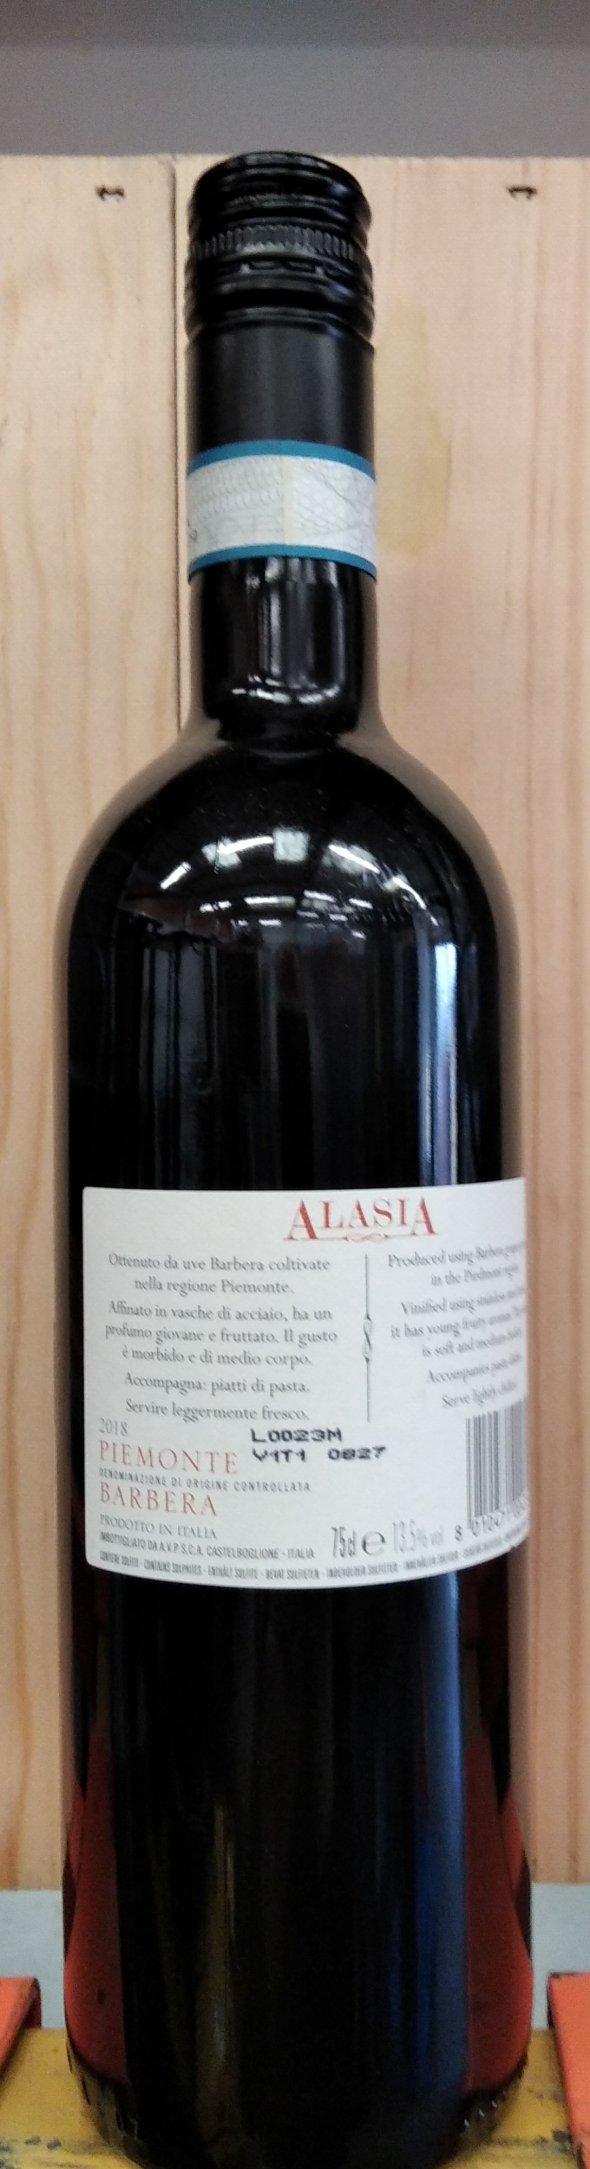 Araldica, Barbera d'Asti, Alasia